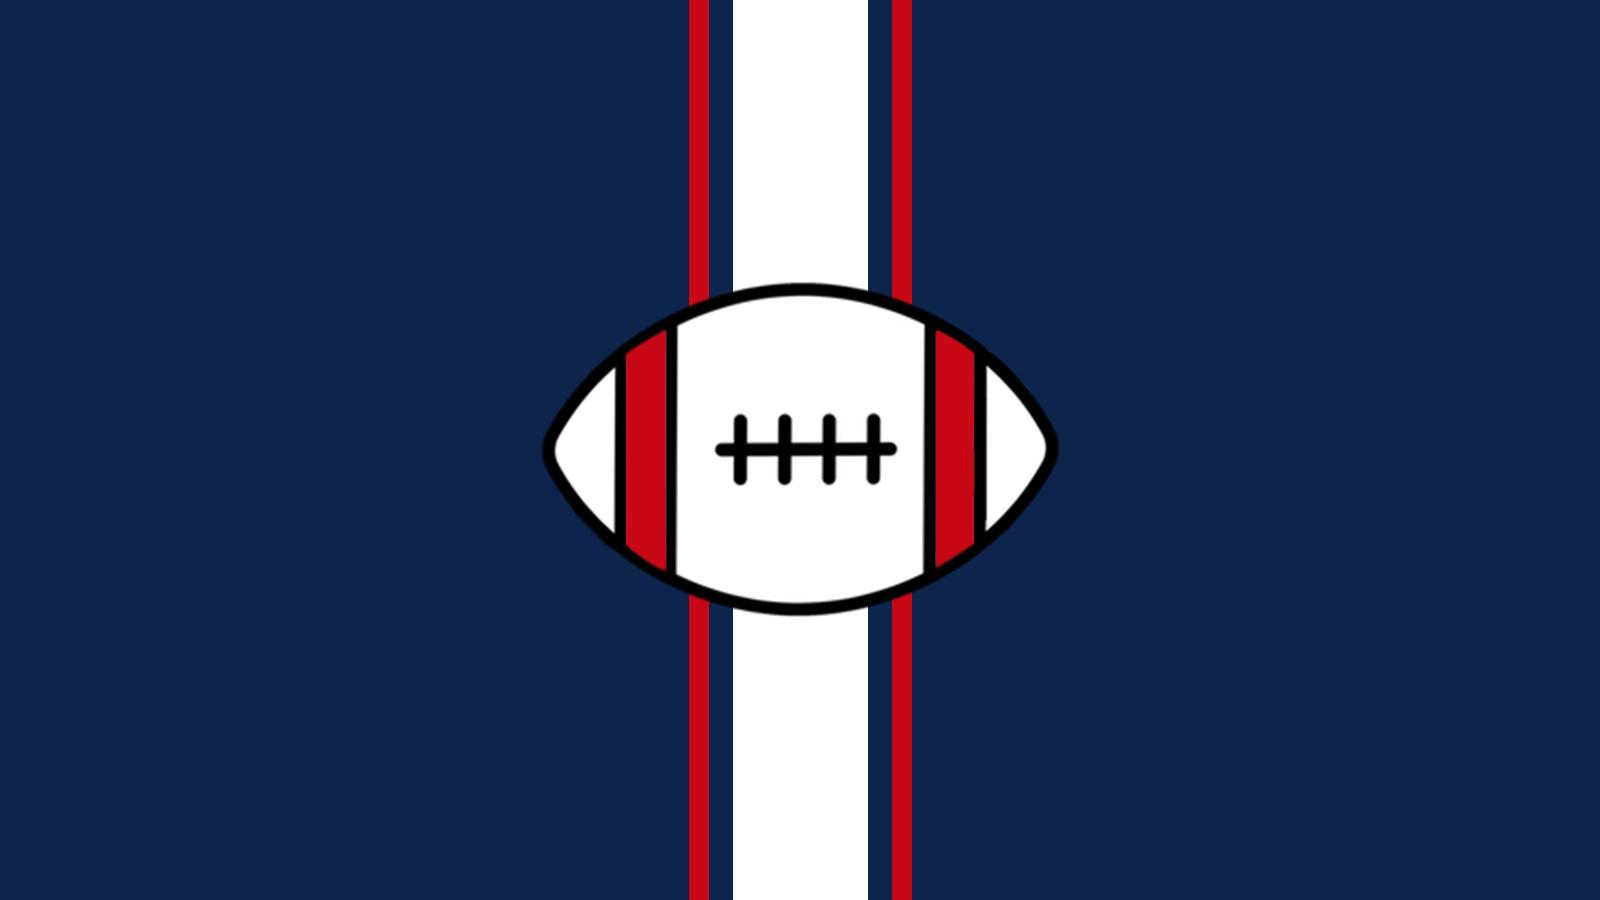 New England Patriots Playoff Tickets